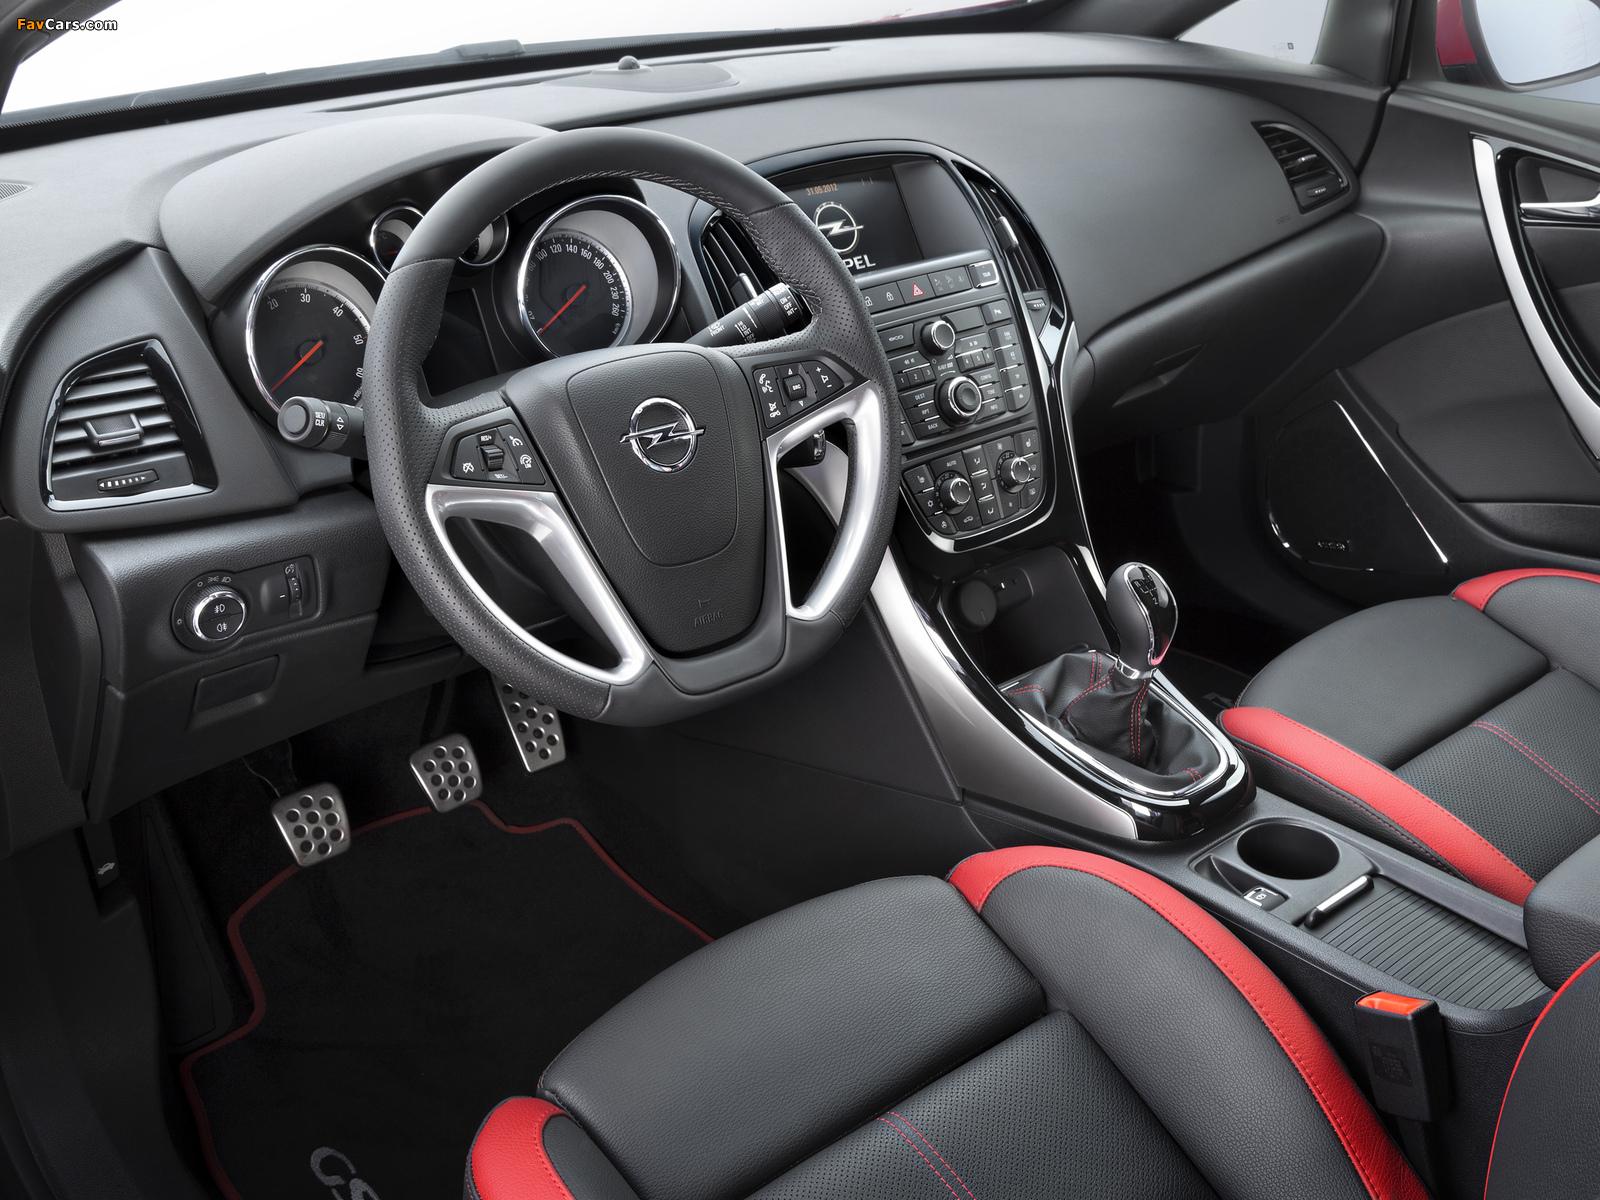 Opel Astra GSI BiTurbo Panoramic (J) 2012 images (1600 x 1200)